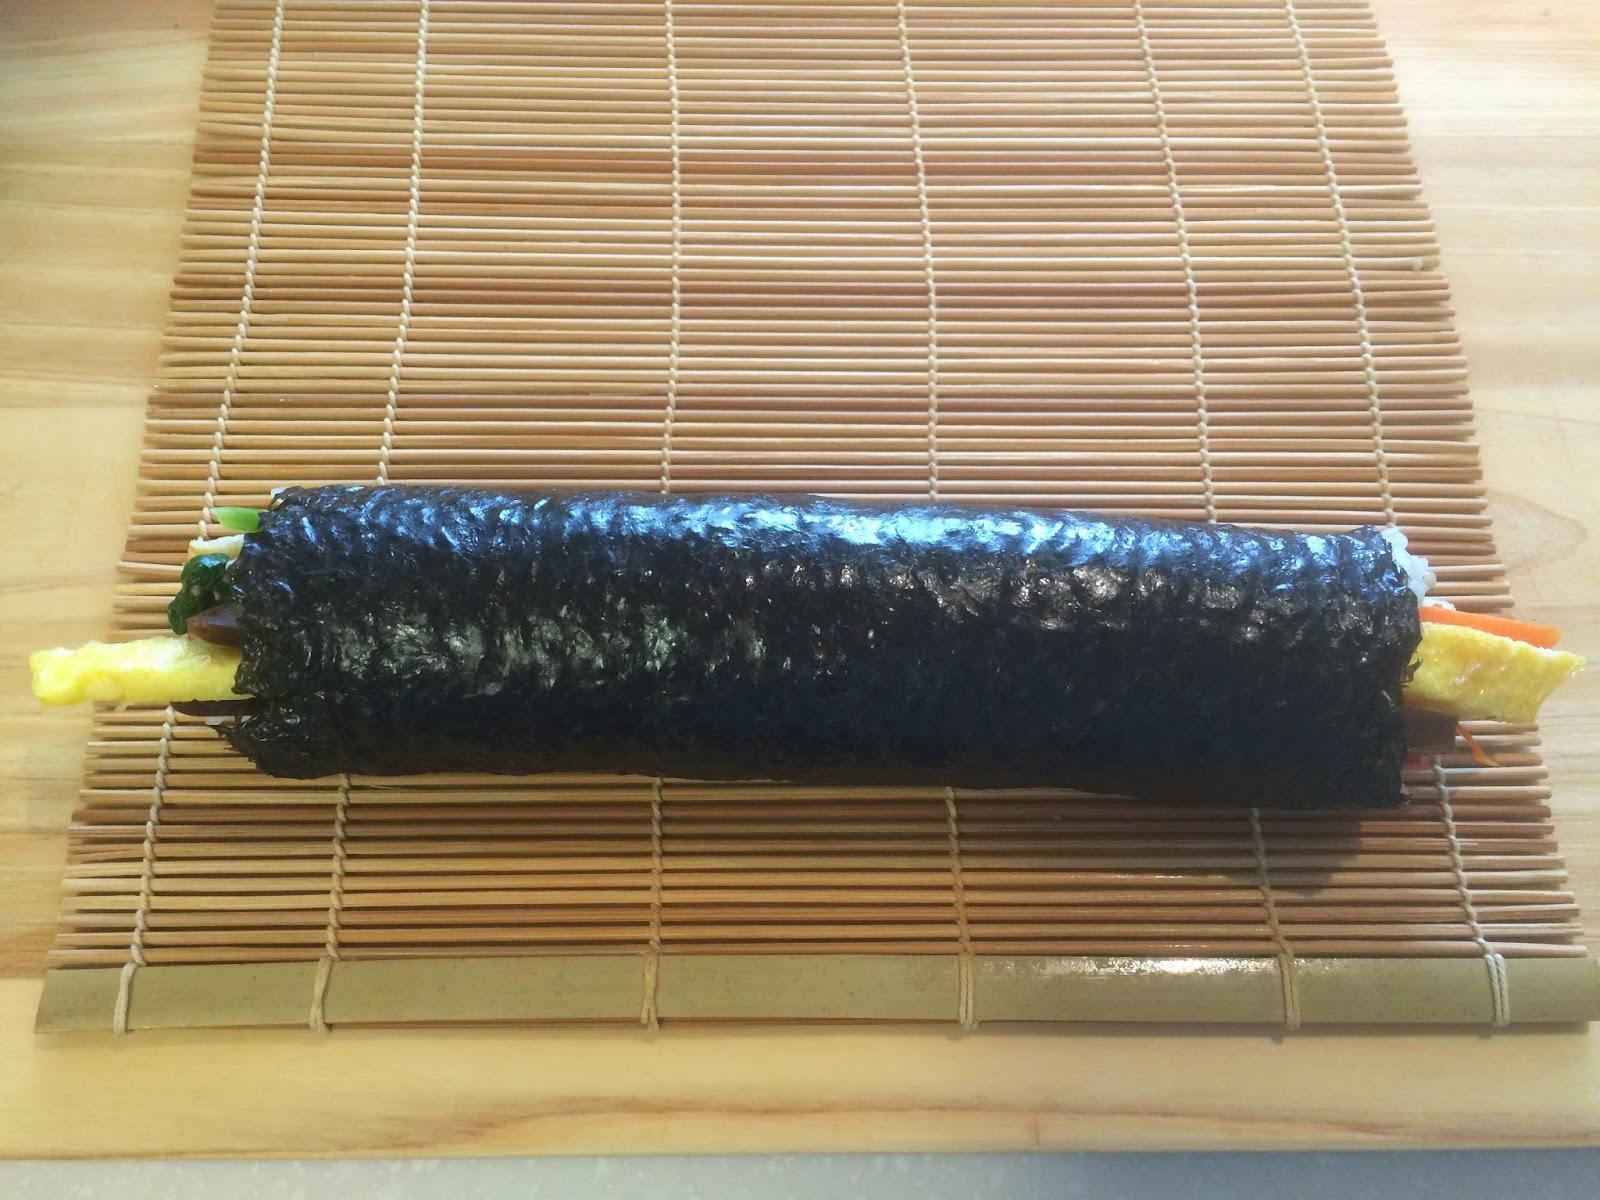 chungmu gimbap classical cooked rice danmuji gwangjang market kimchi korean food Korean Foods mayak gimbap samgak gimbap seaweed paper seoul sesame oil South Korean yellow picked radish